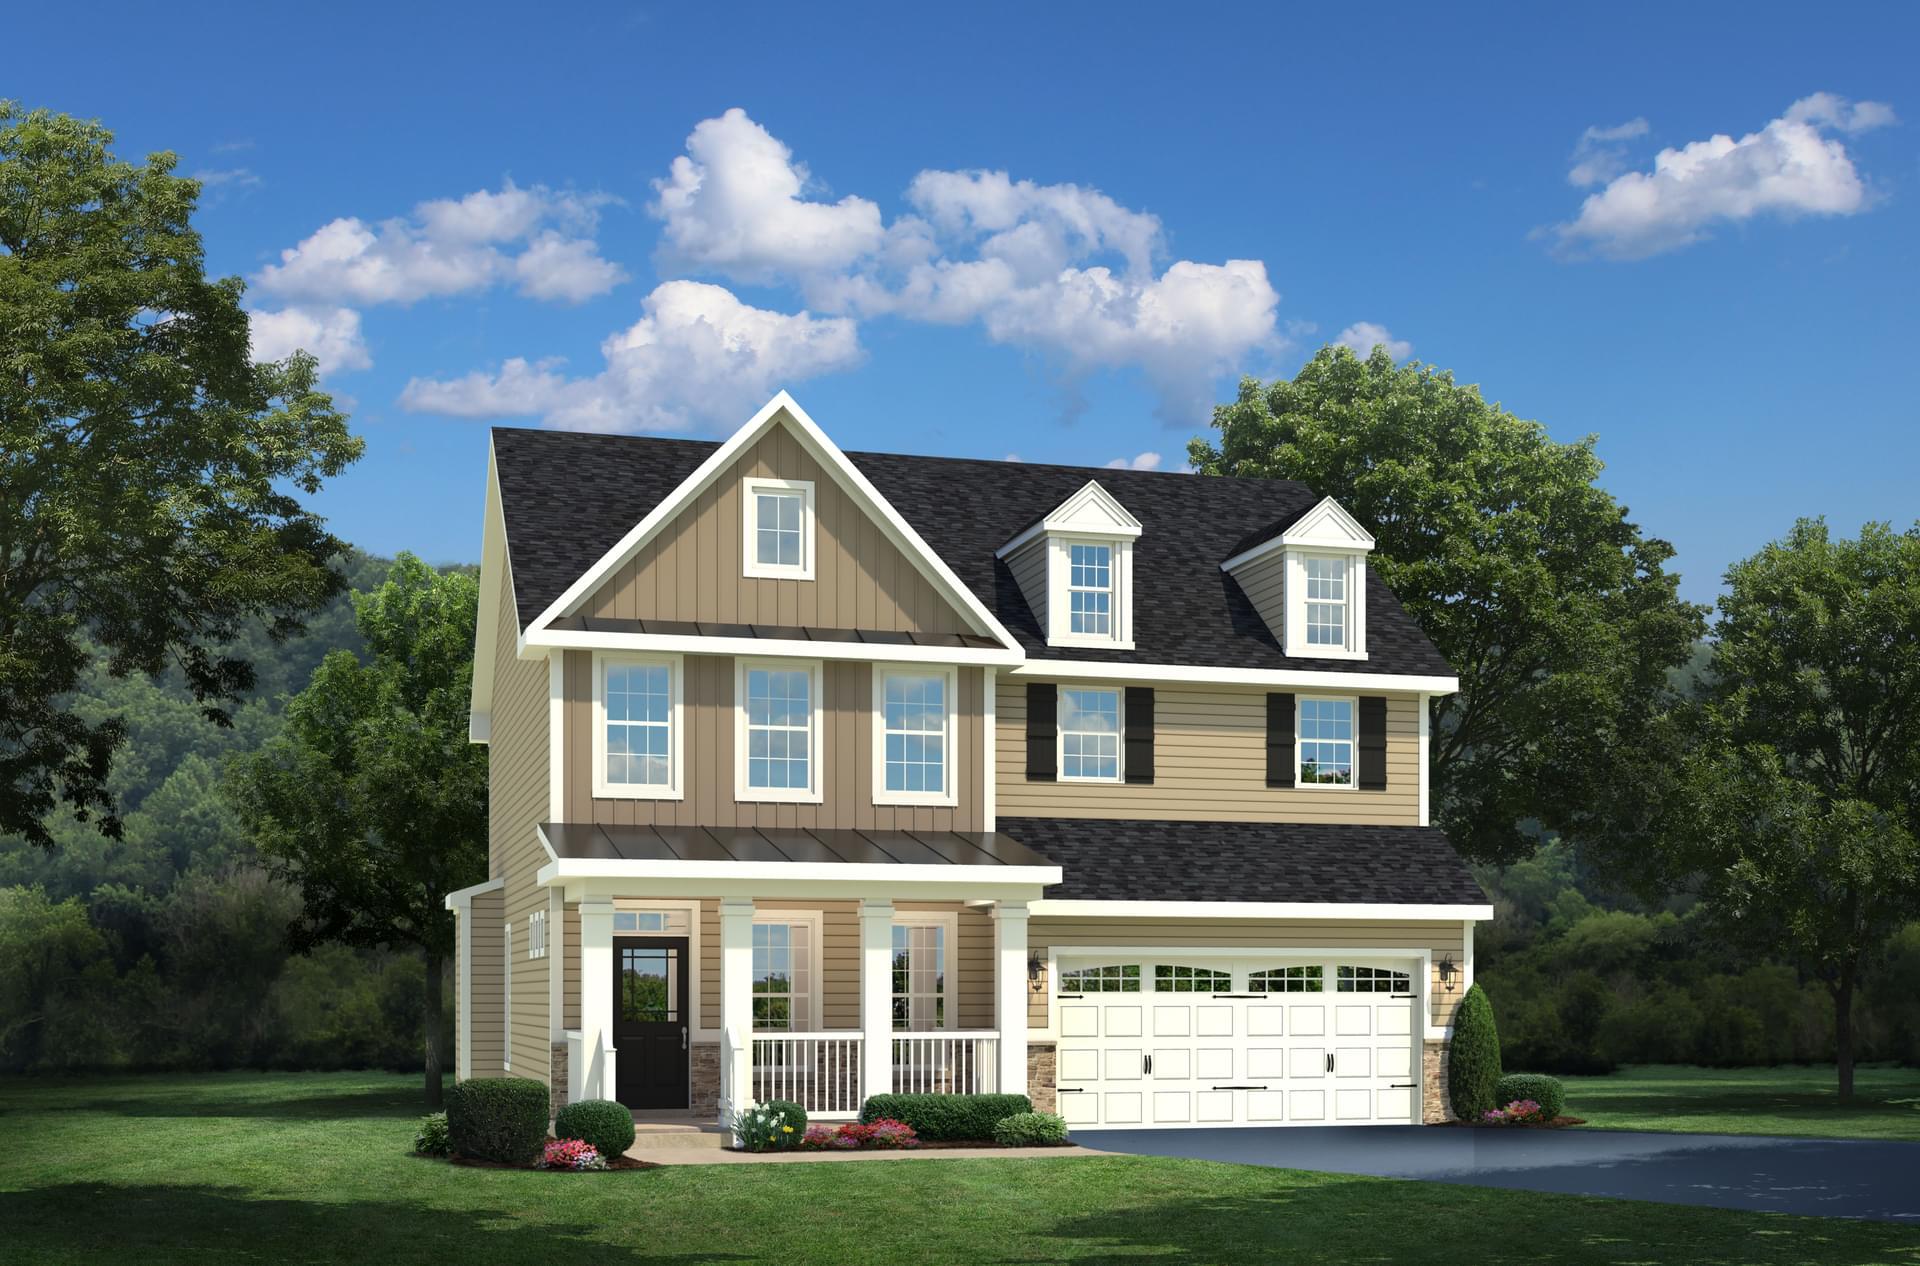 New Homes In Severn Md Crossland Farm From Koch Homes